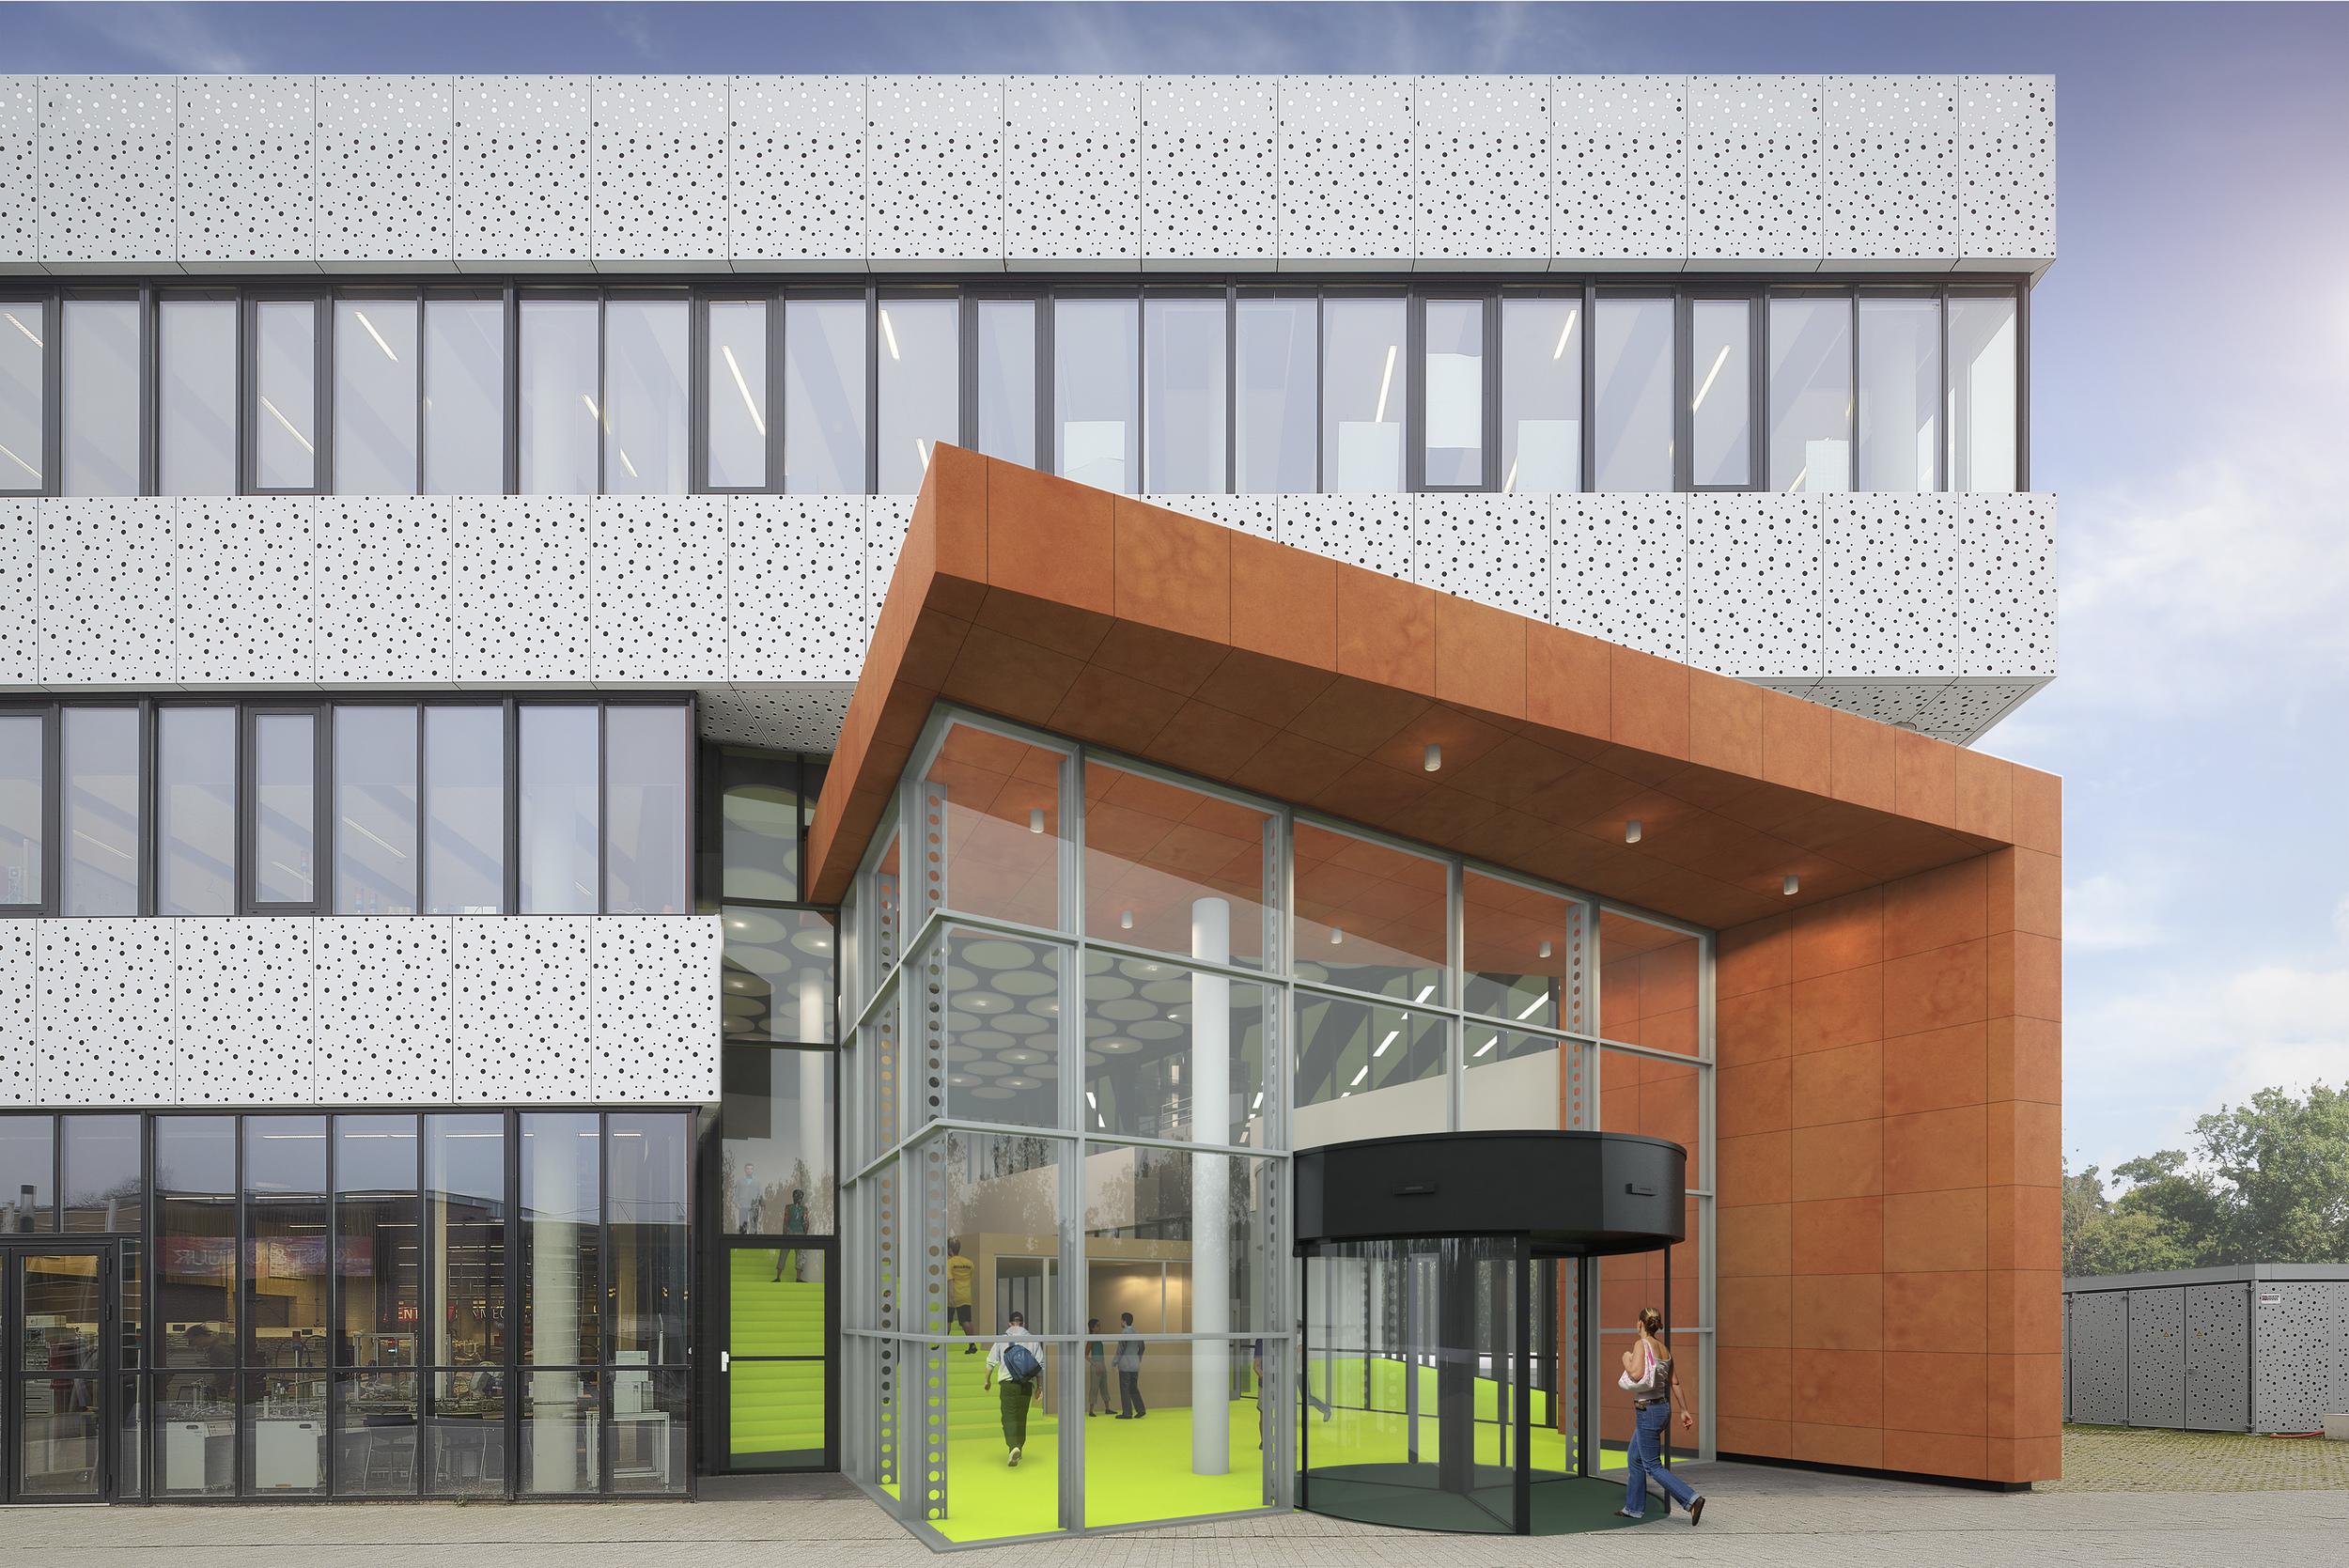 Fotomontage van architectuur, artist impressions oenbare ruimte